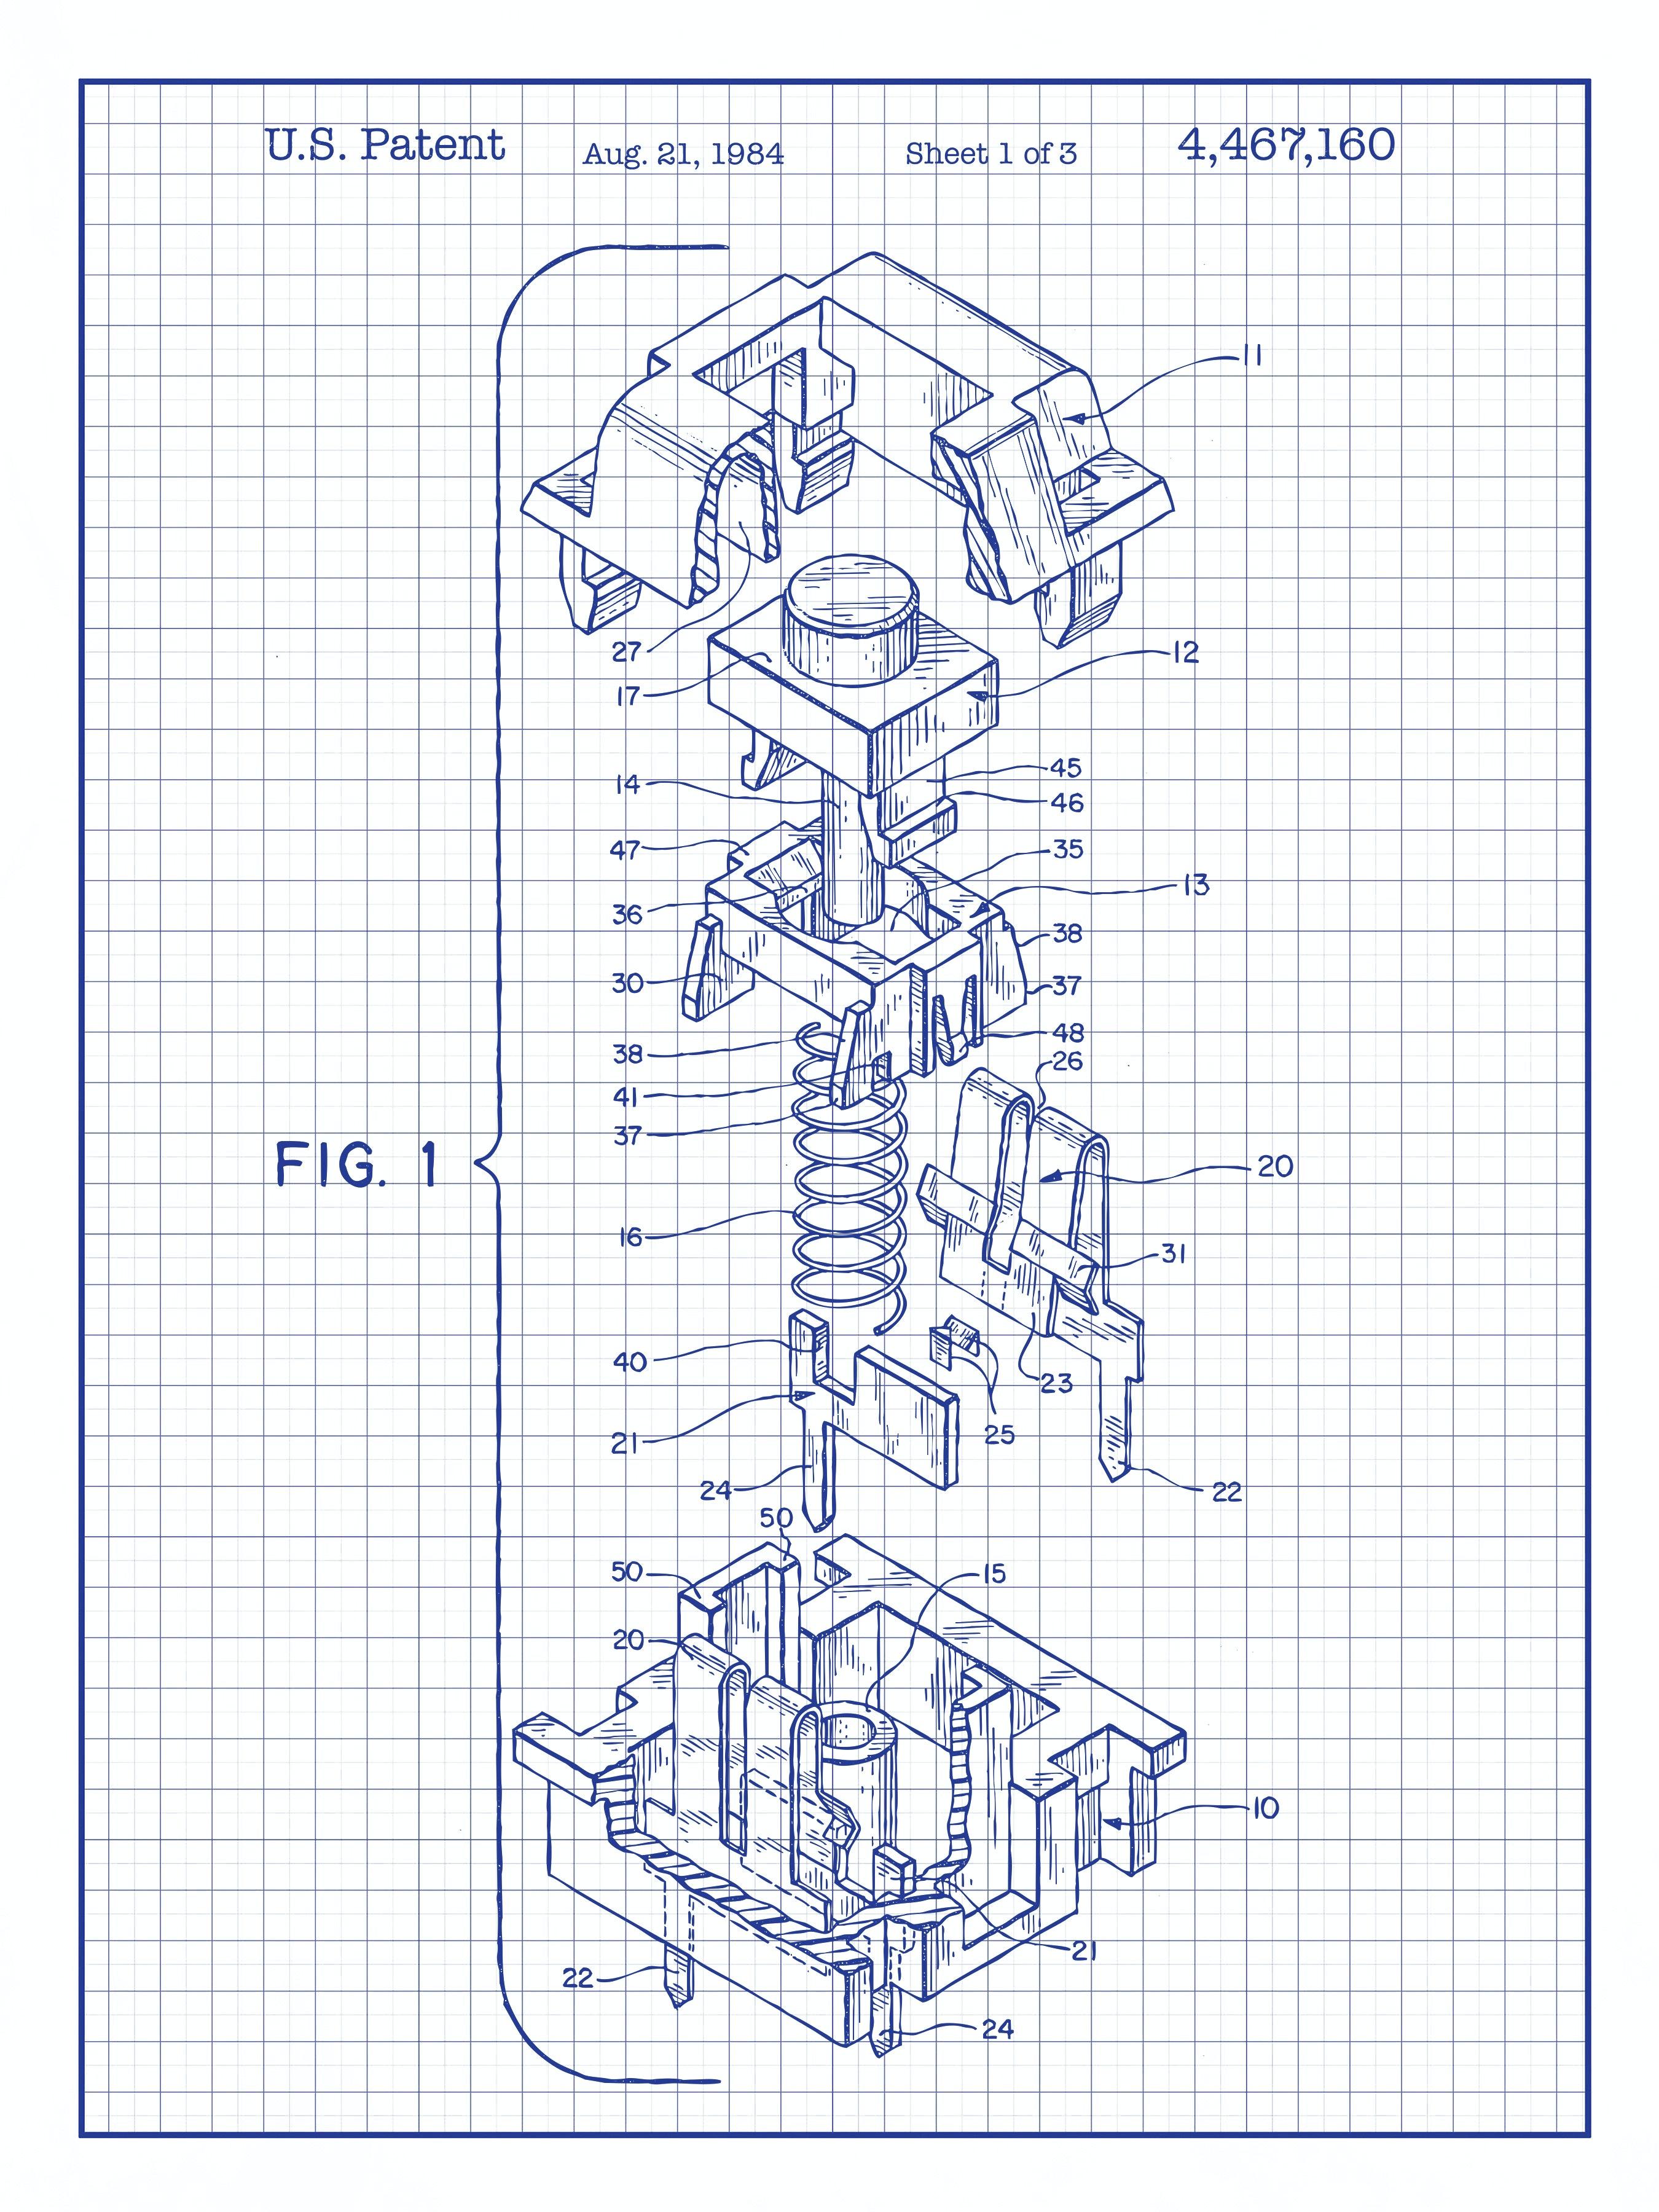 Mechanical Key Cap - 4,467,160